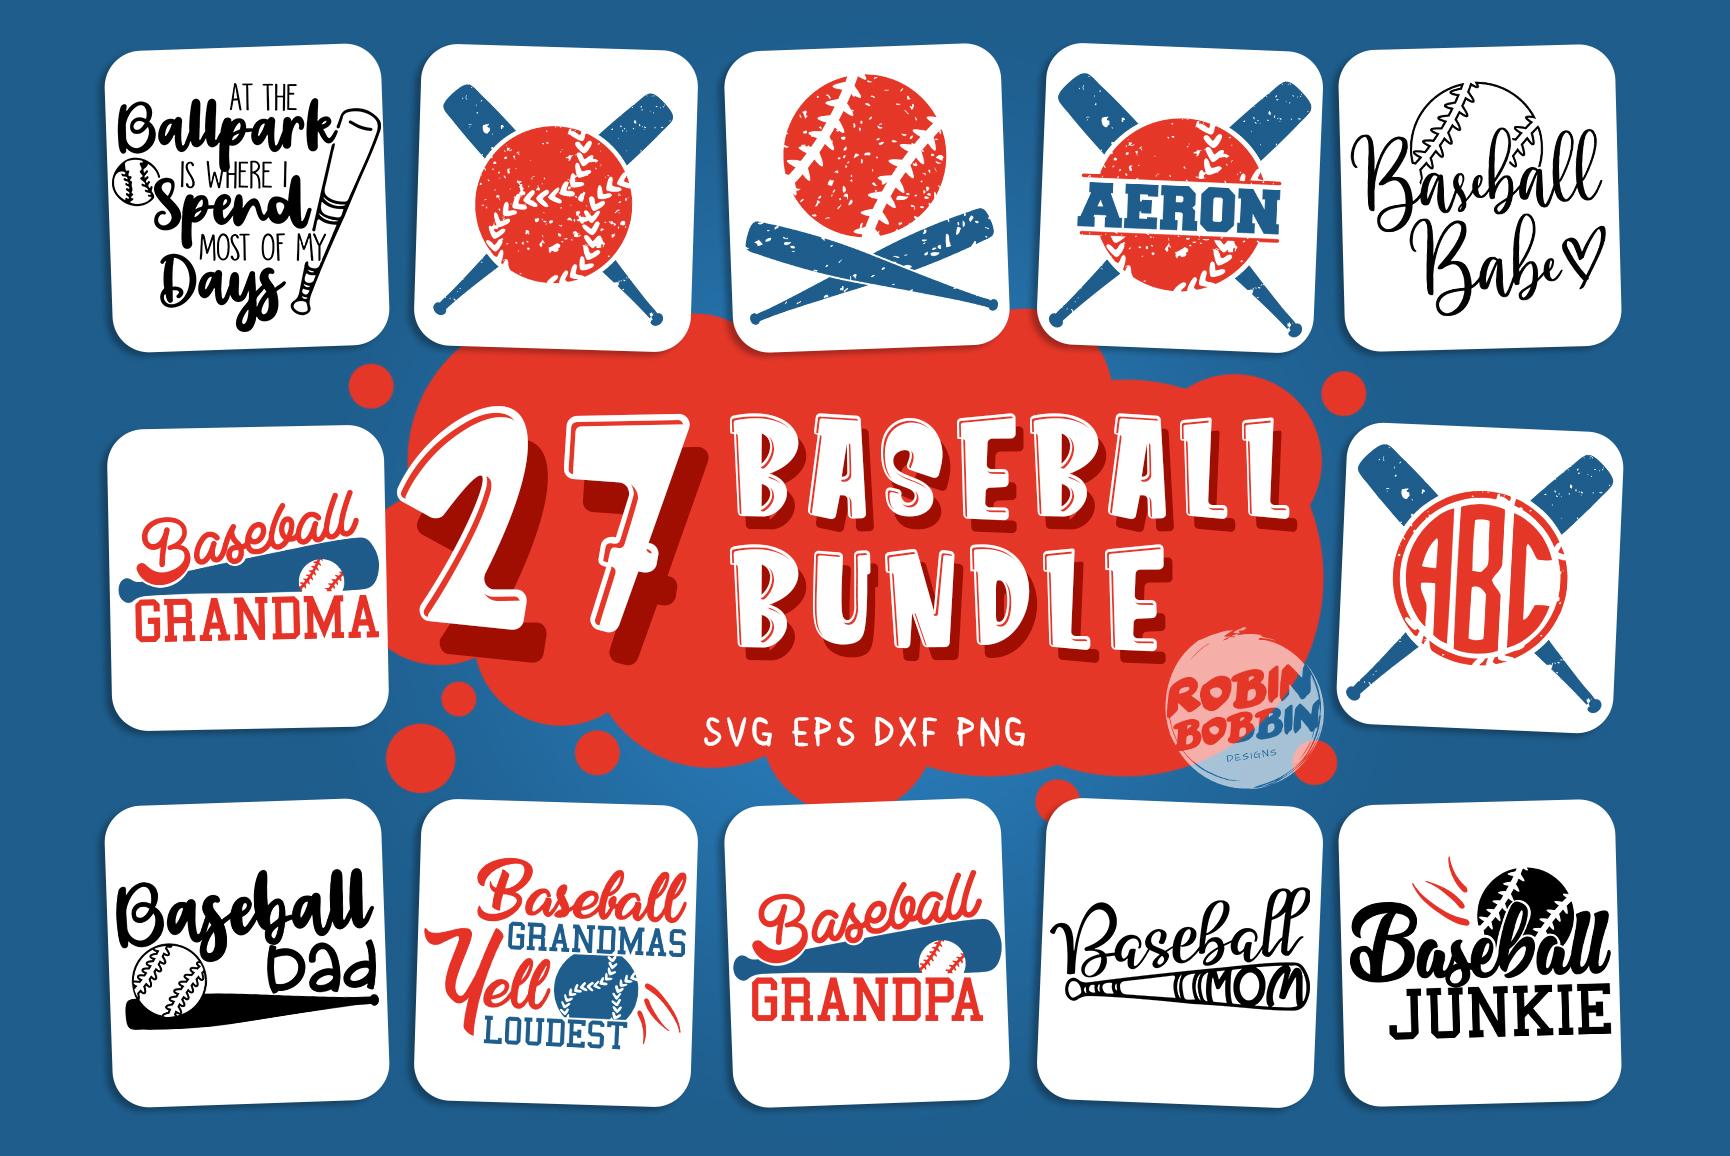 Big Baseball Bundle vol.1 - Baseball SVG Bundle example image 1